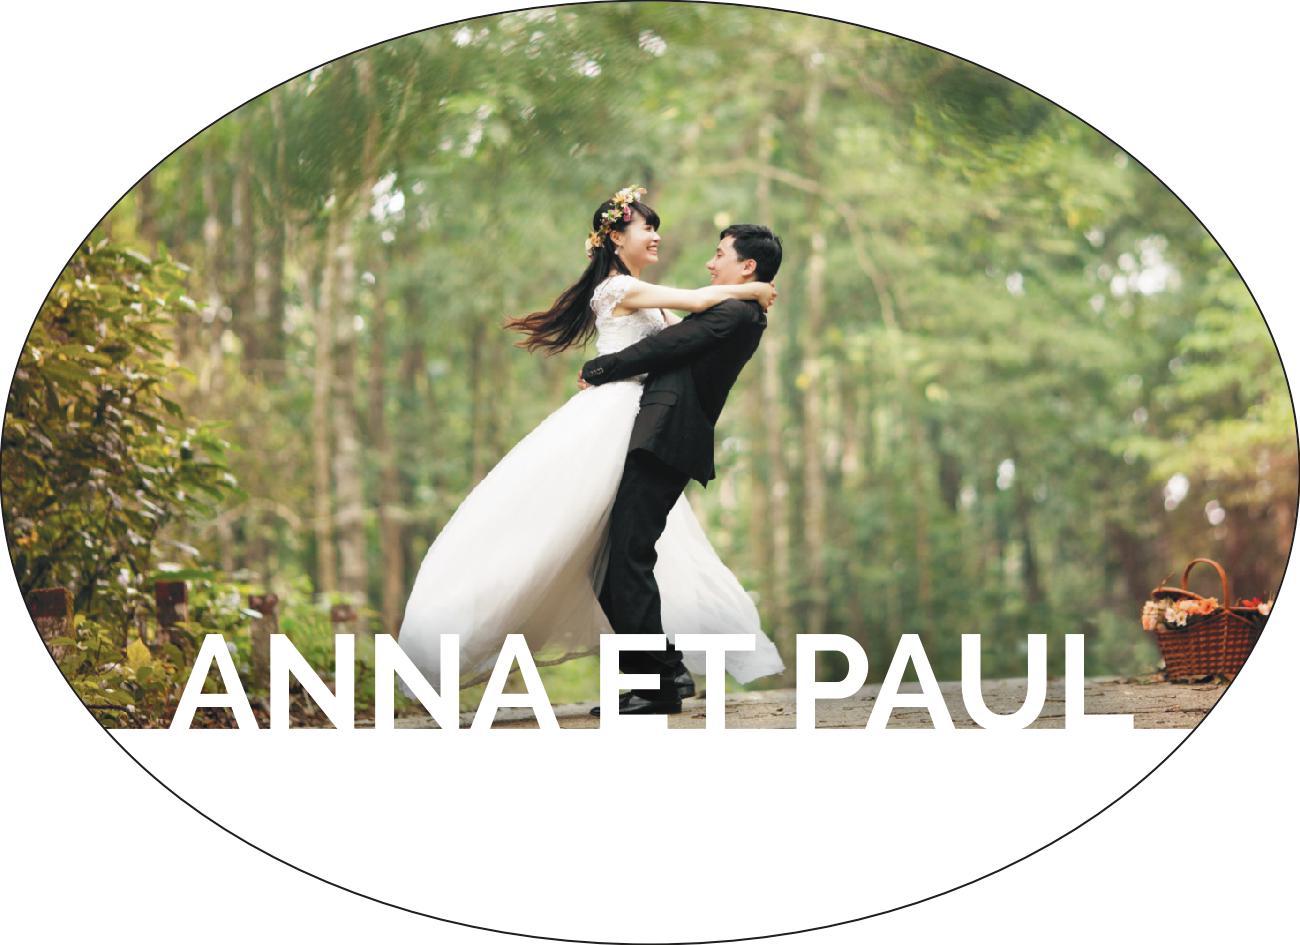 wedding-anna-paul_has-image